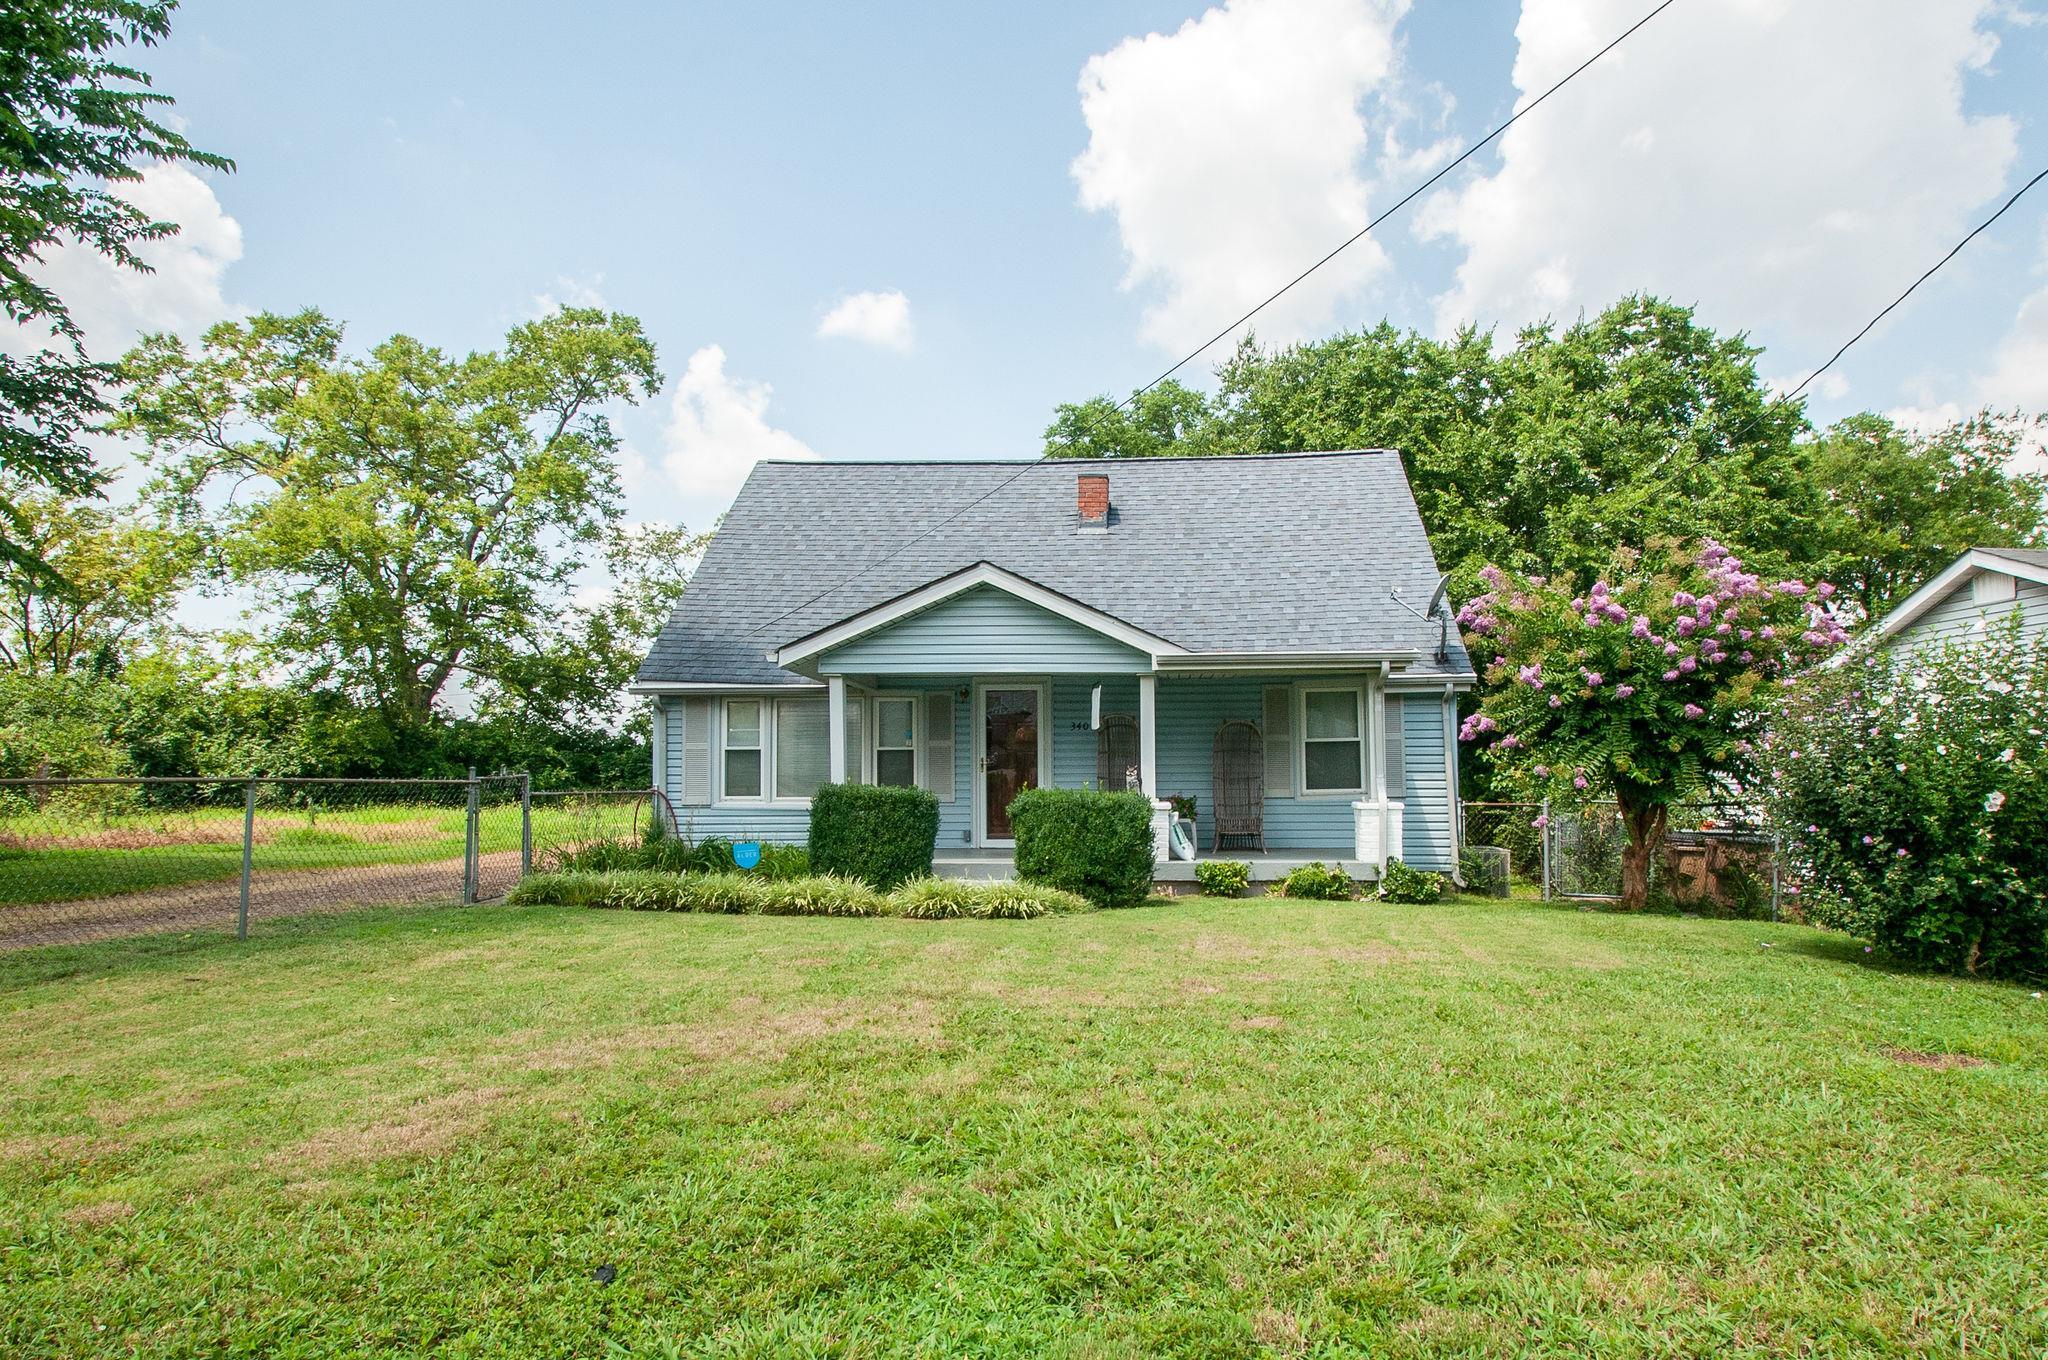 3409 Mays St, Nashville, TN 37211 - Nashville, TN real estate listing